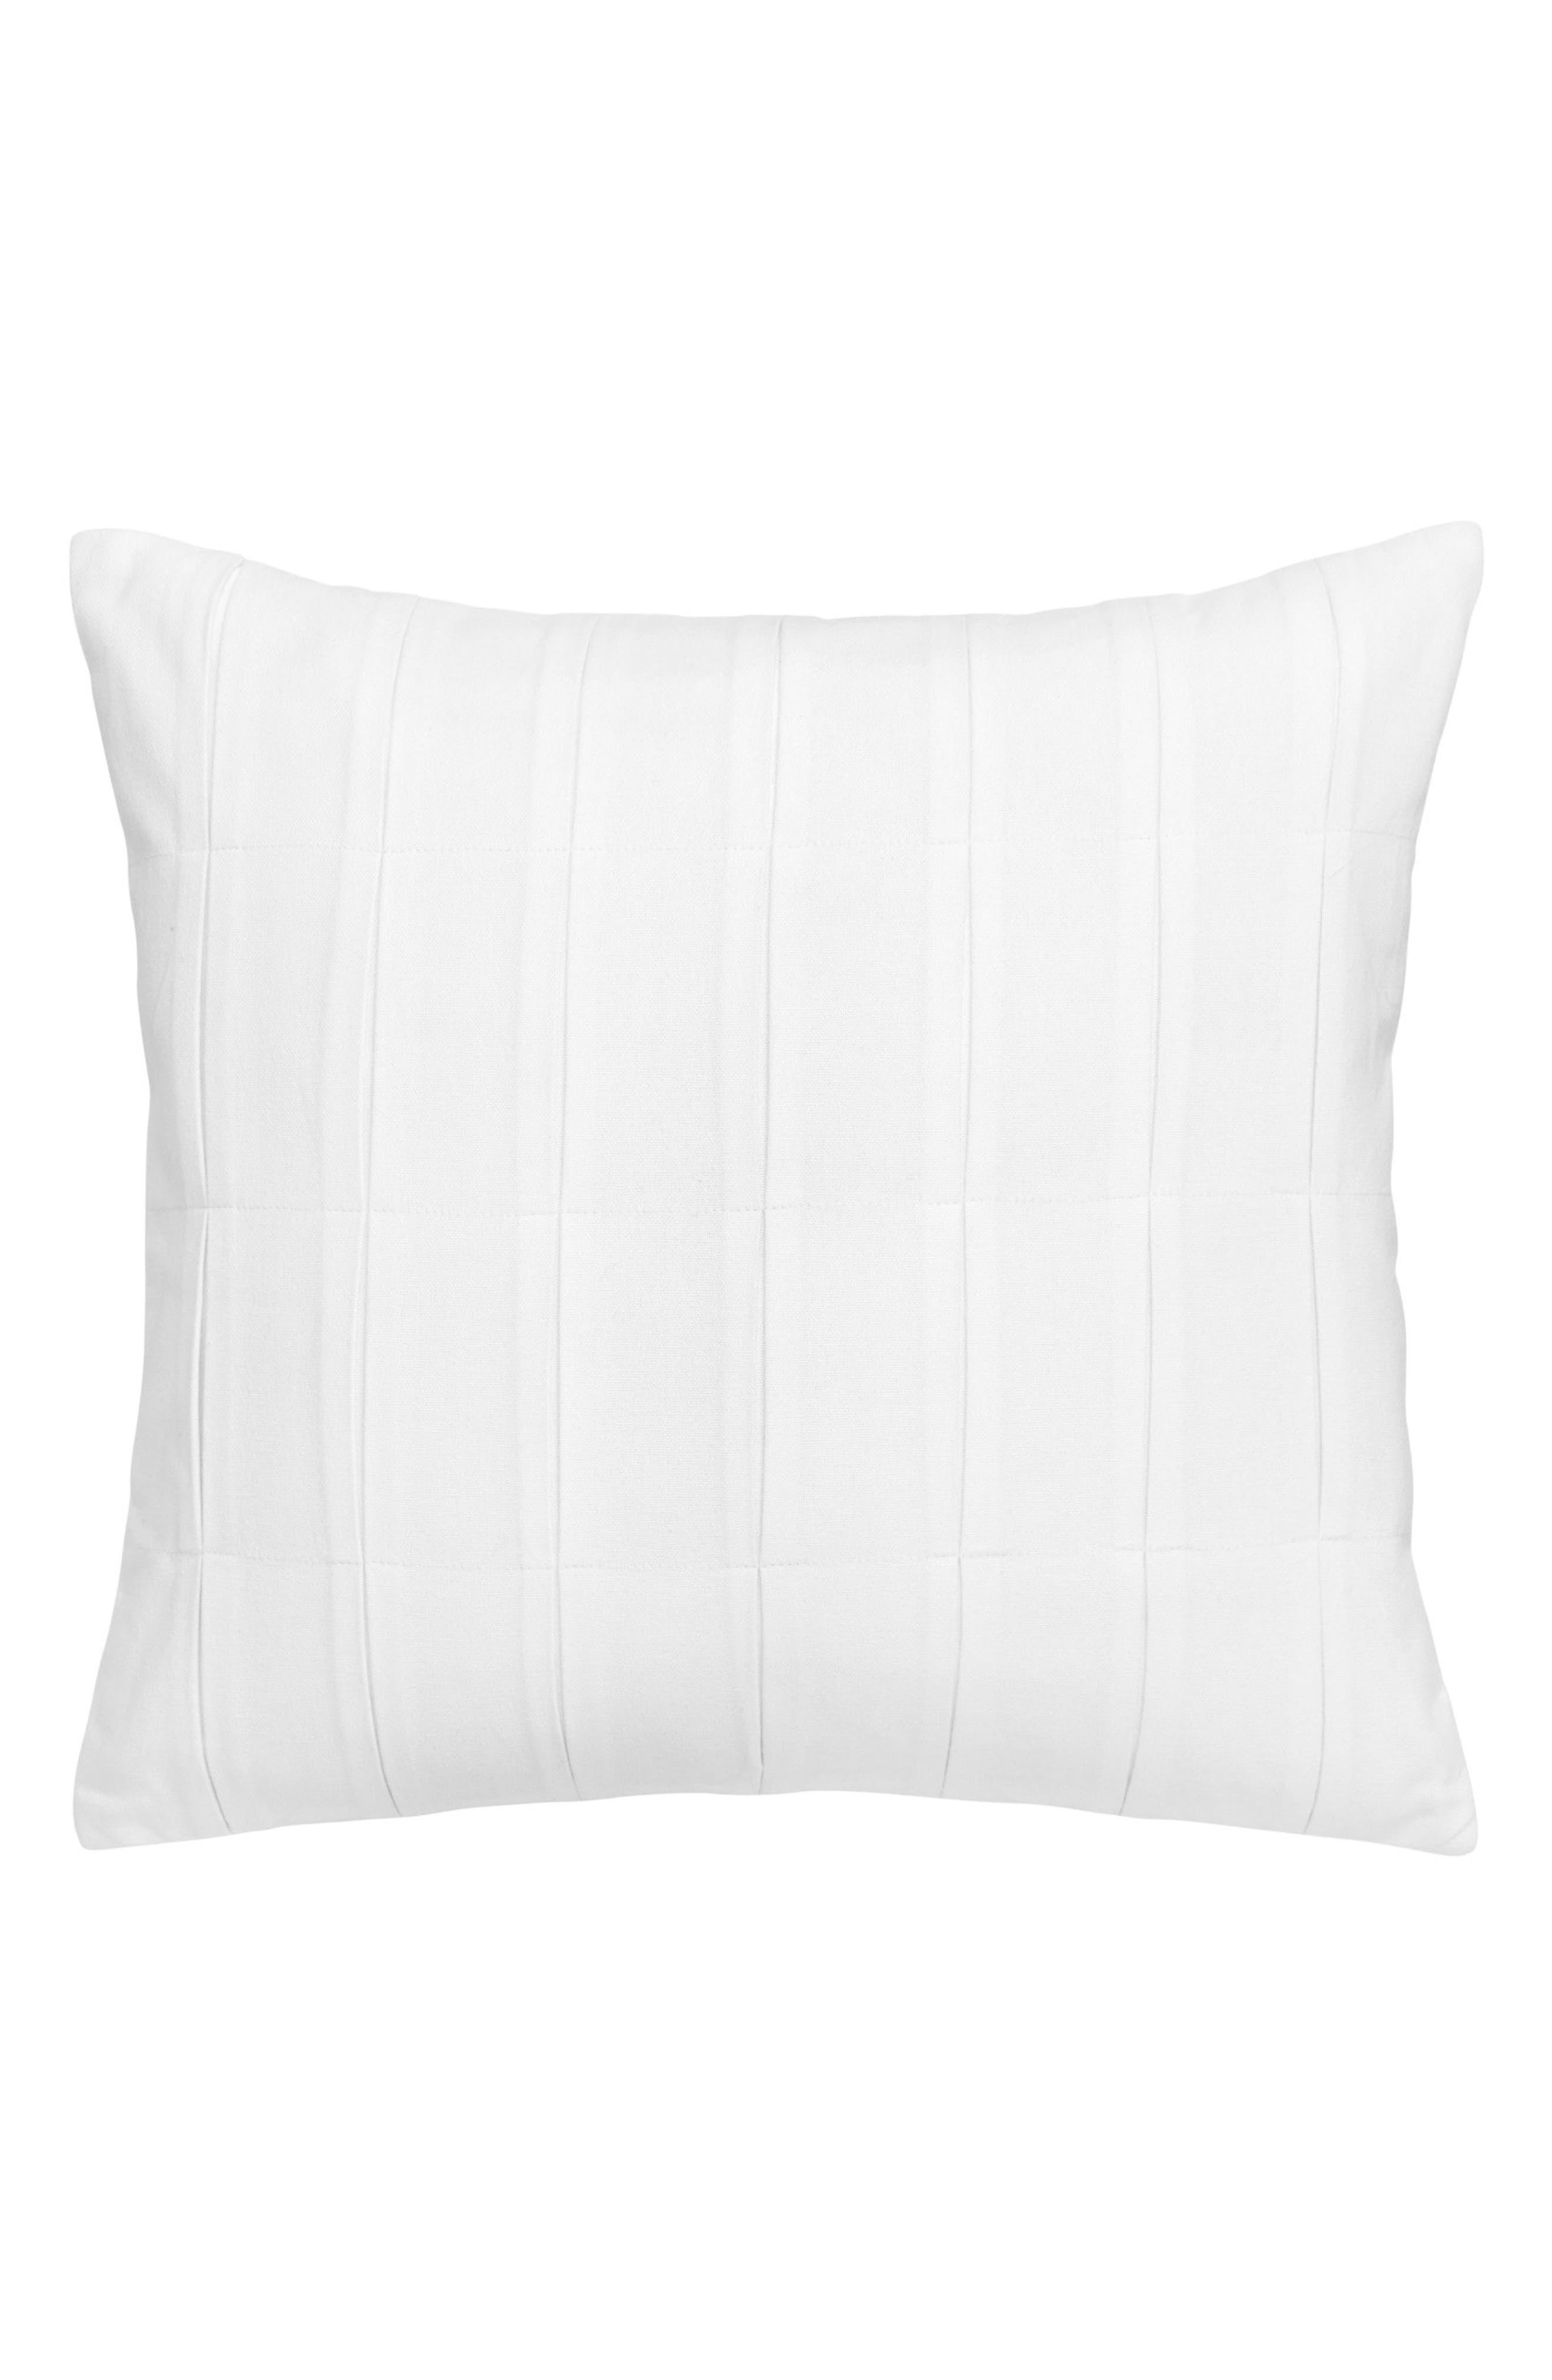 Jill Rosenwald Capri Stripe Accent Pillow